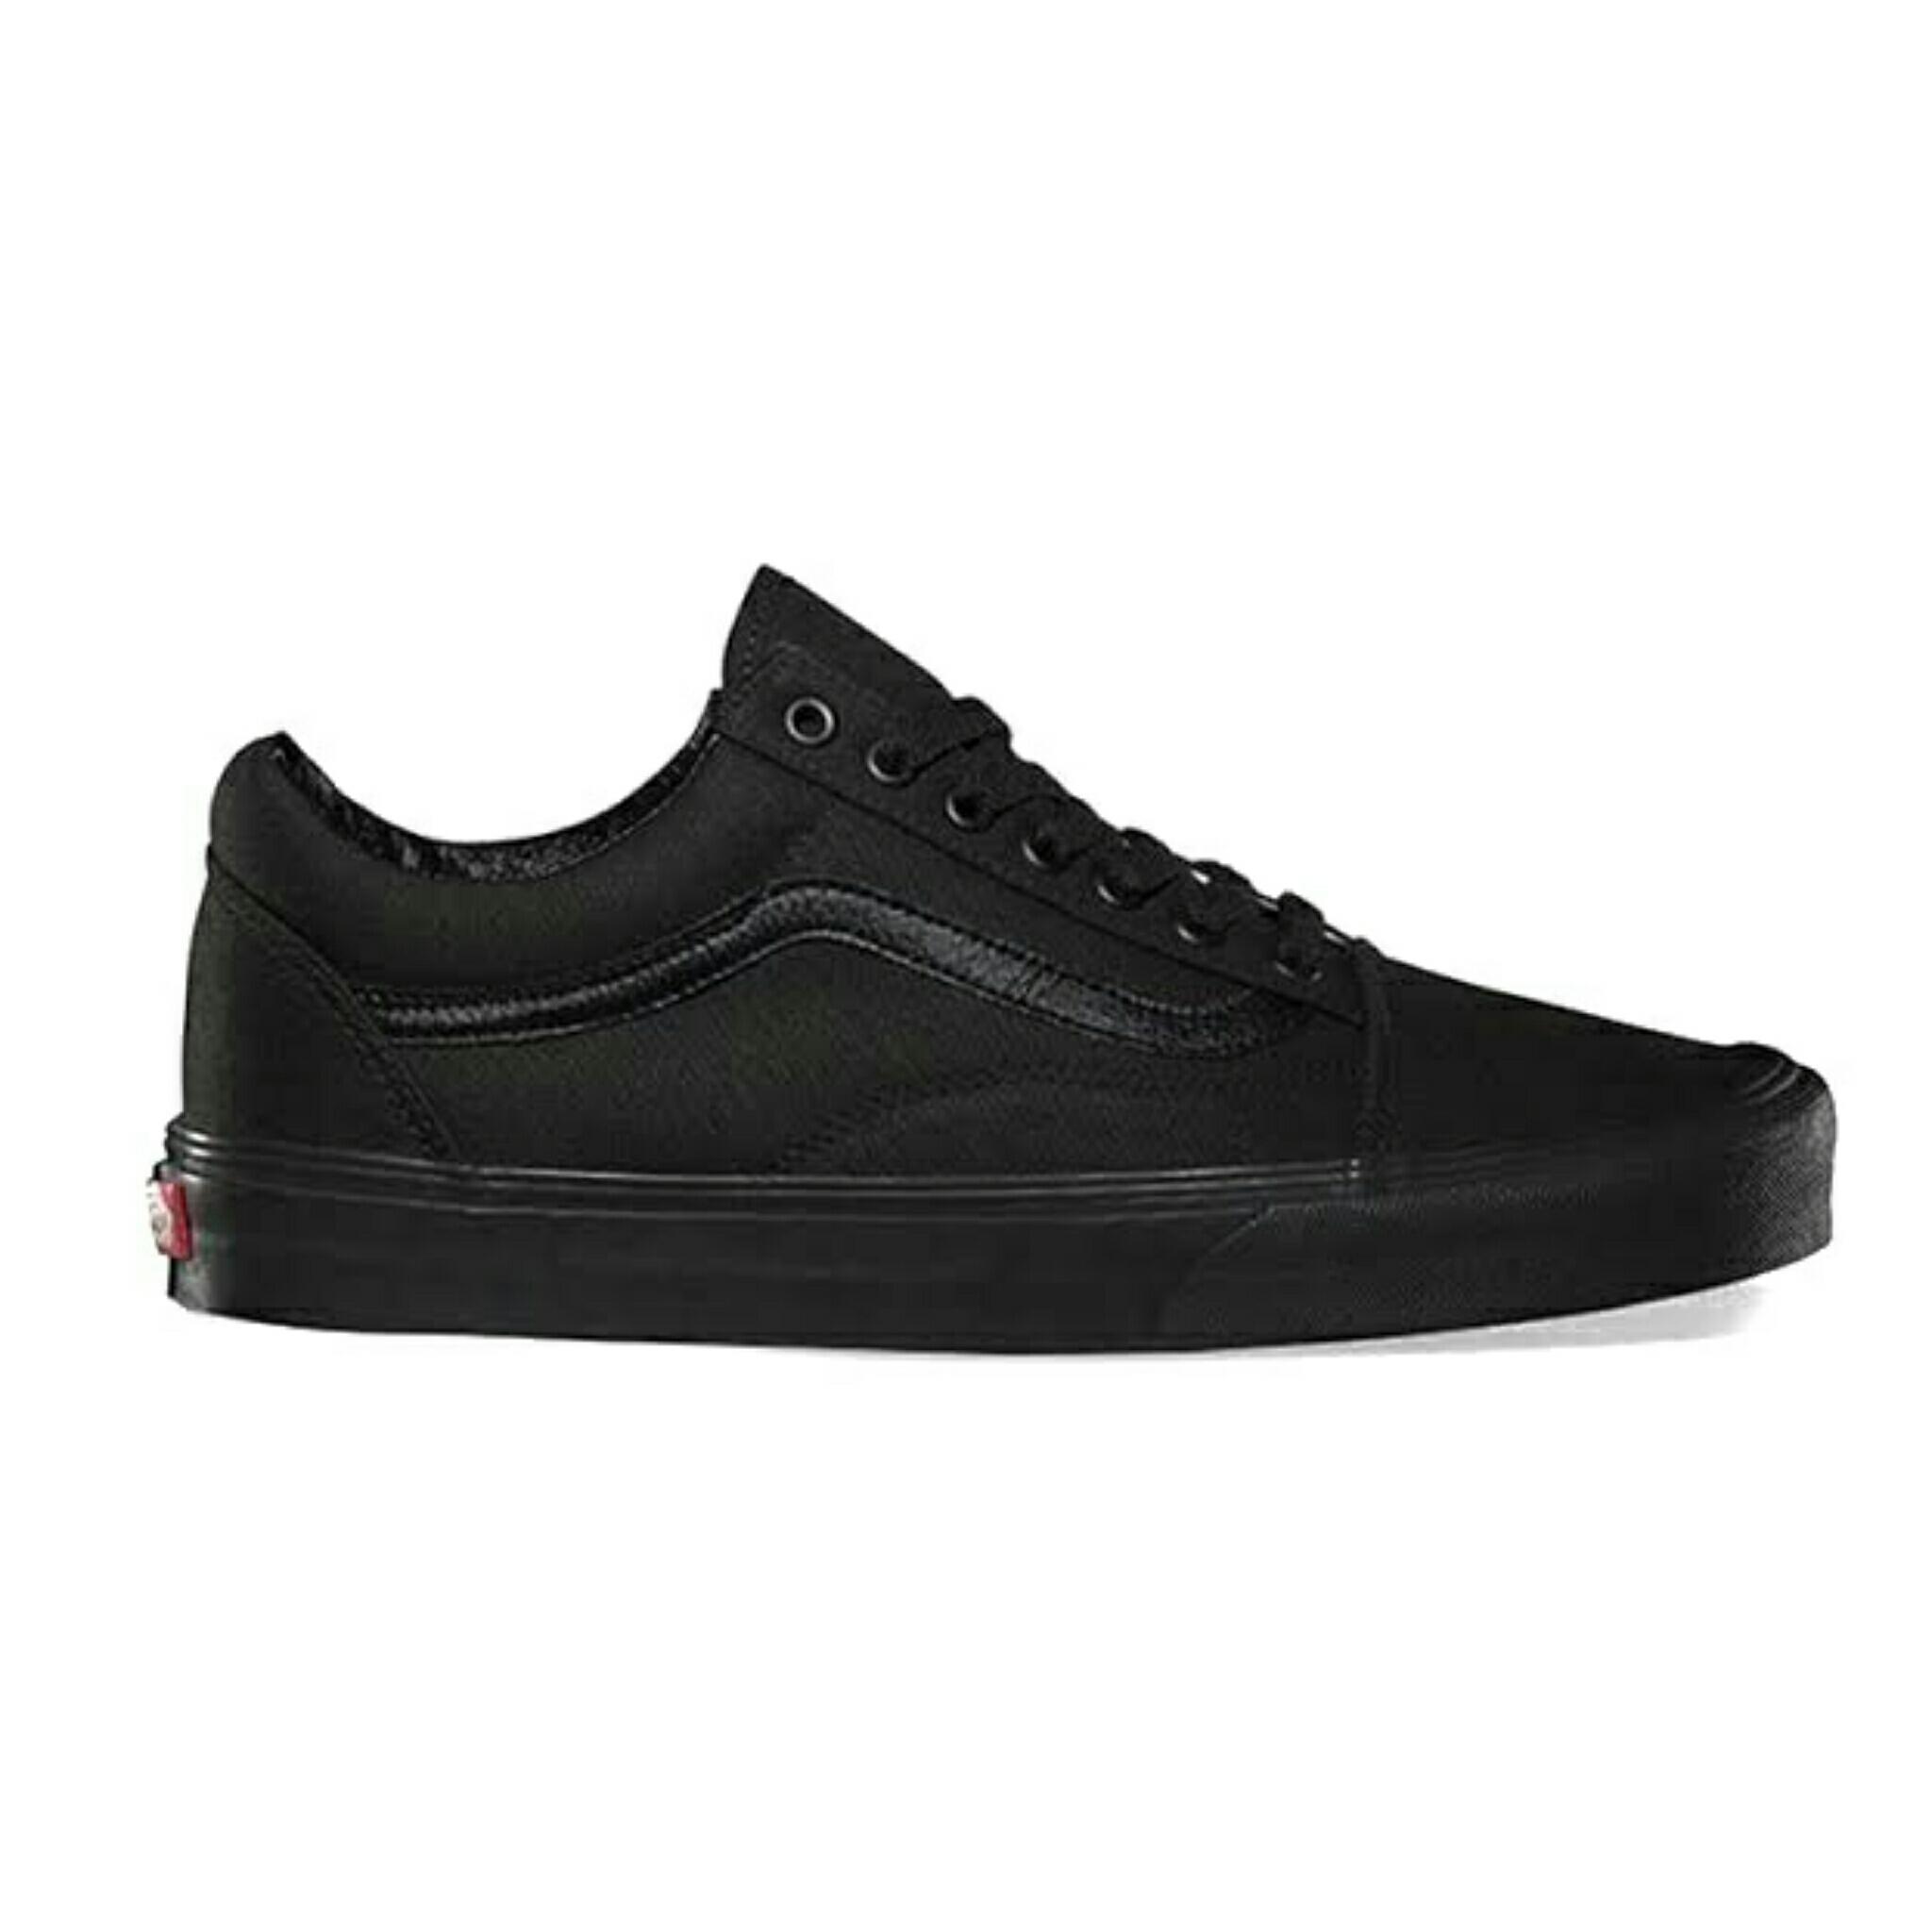 Sepatu Vans Old Skool Classic Black White All Black All White / Sepatu Sneakers Pria / Sepatu Casual Skate Keren Gaya Murah Couple OS Old School